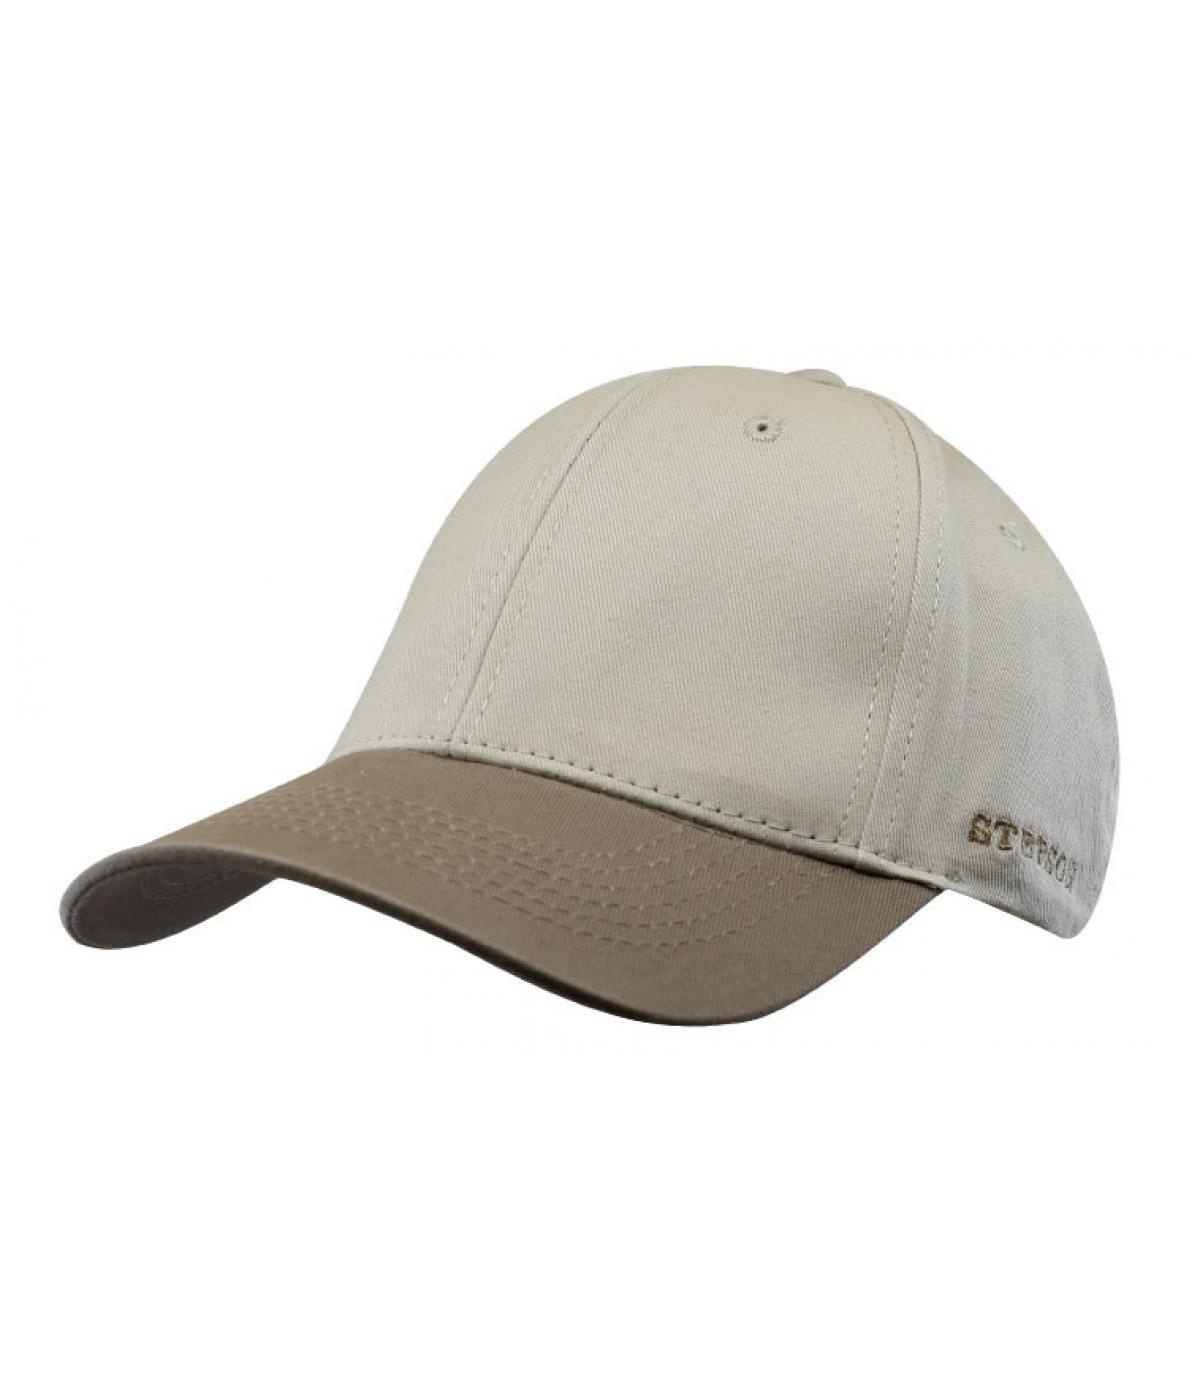 Details Baseball Cap Cotton brown beige - afbeeling 2